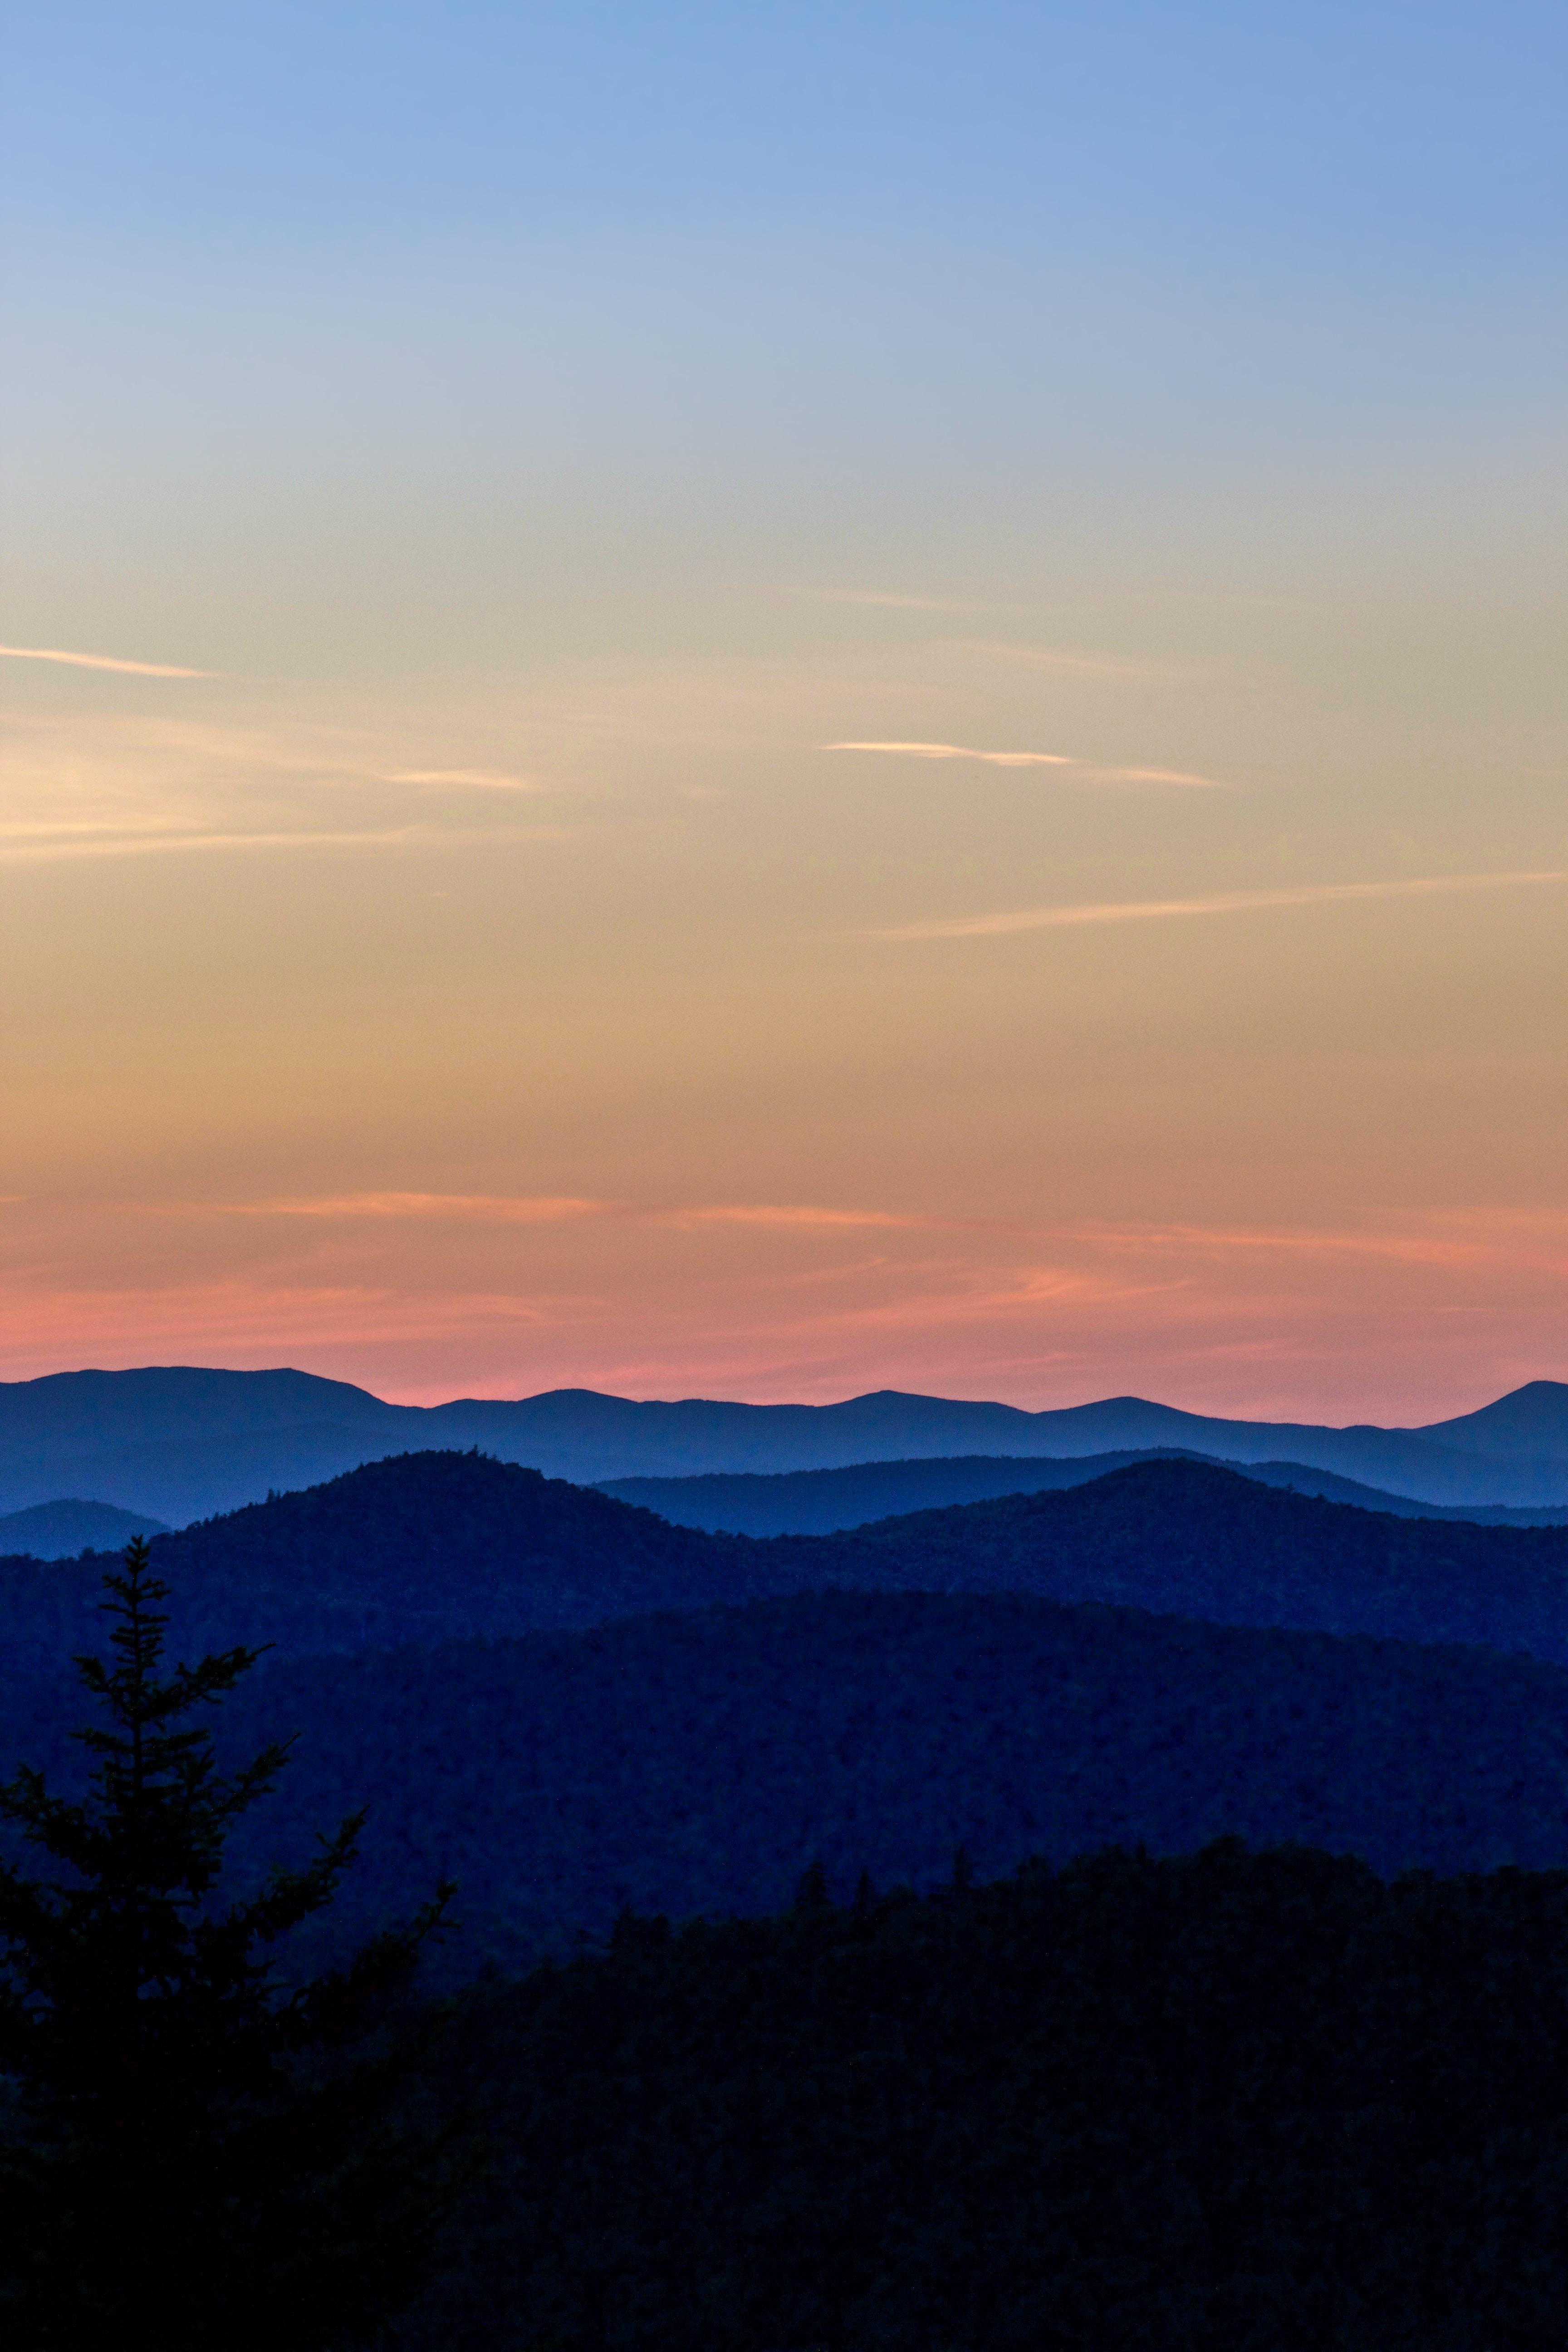 mountain hills under blue sky